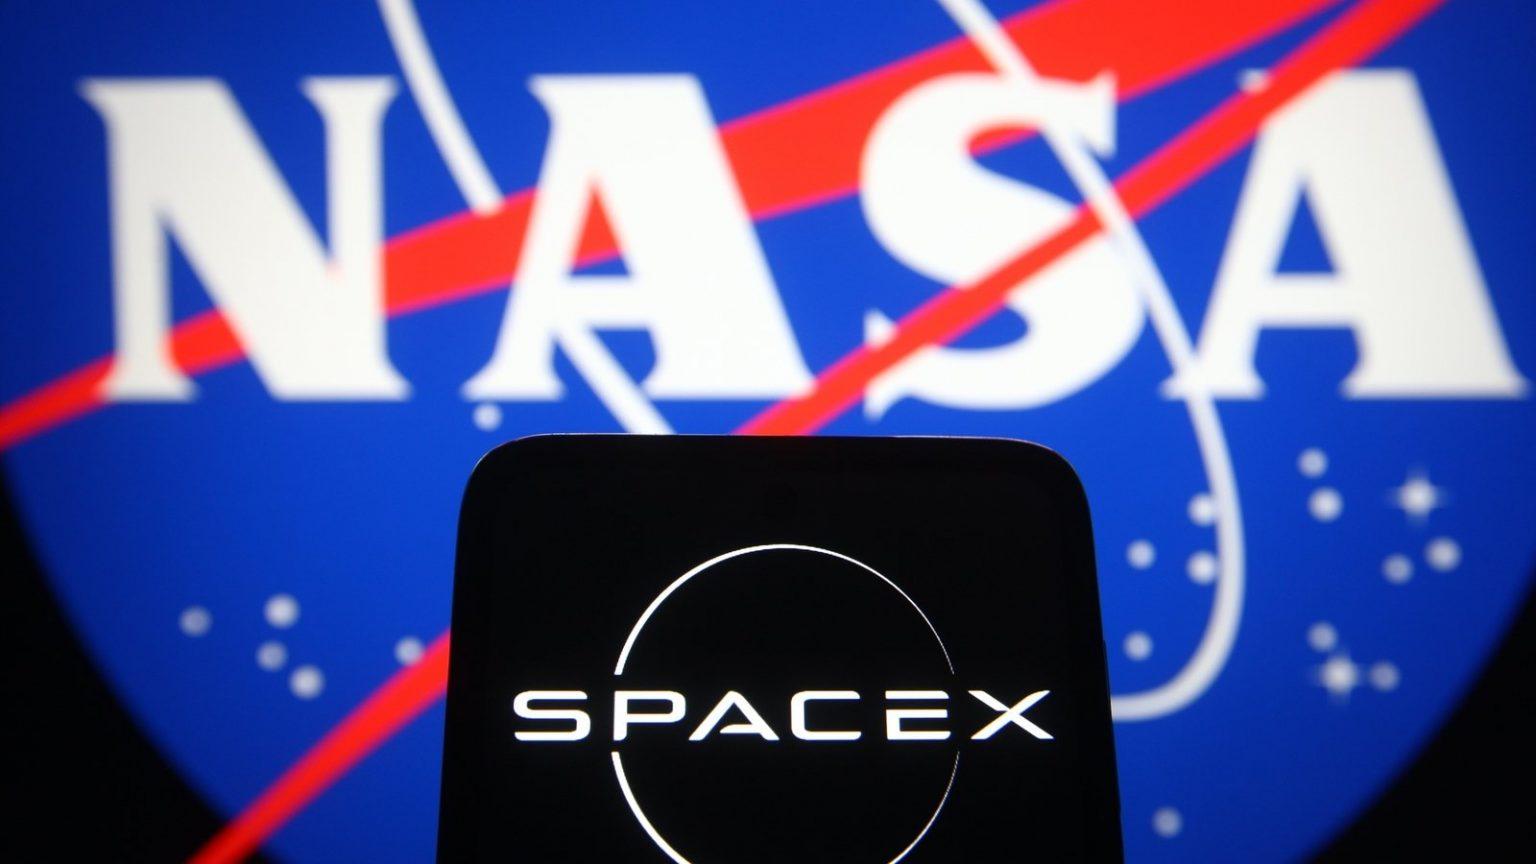 NASA selects SpaceX for mission to Jupiter moon Europa  വ്യാഴം ചന്ദ്രനായ യൂറോപ്പയിലേക്കുള്ള ദൗത്യത്തിനായി നാസ സ്പേസ് X തിരഞ്ഞെടുക്കുന്നു_40.1